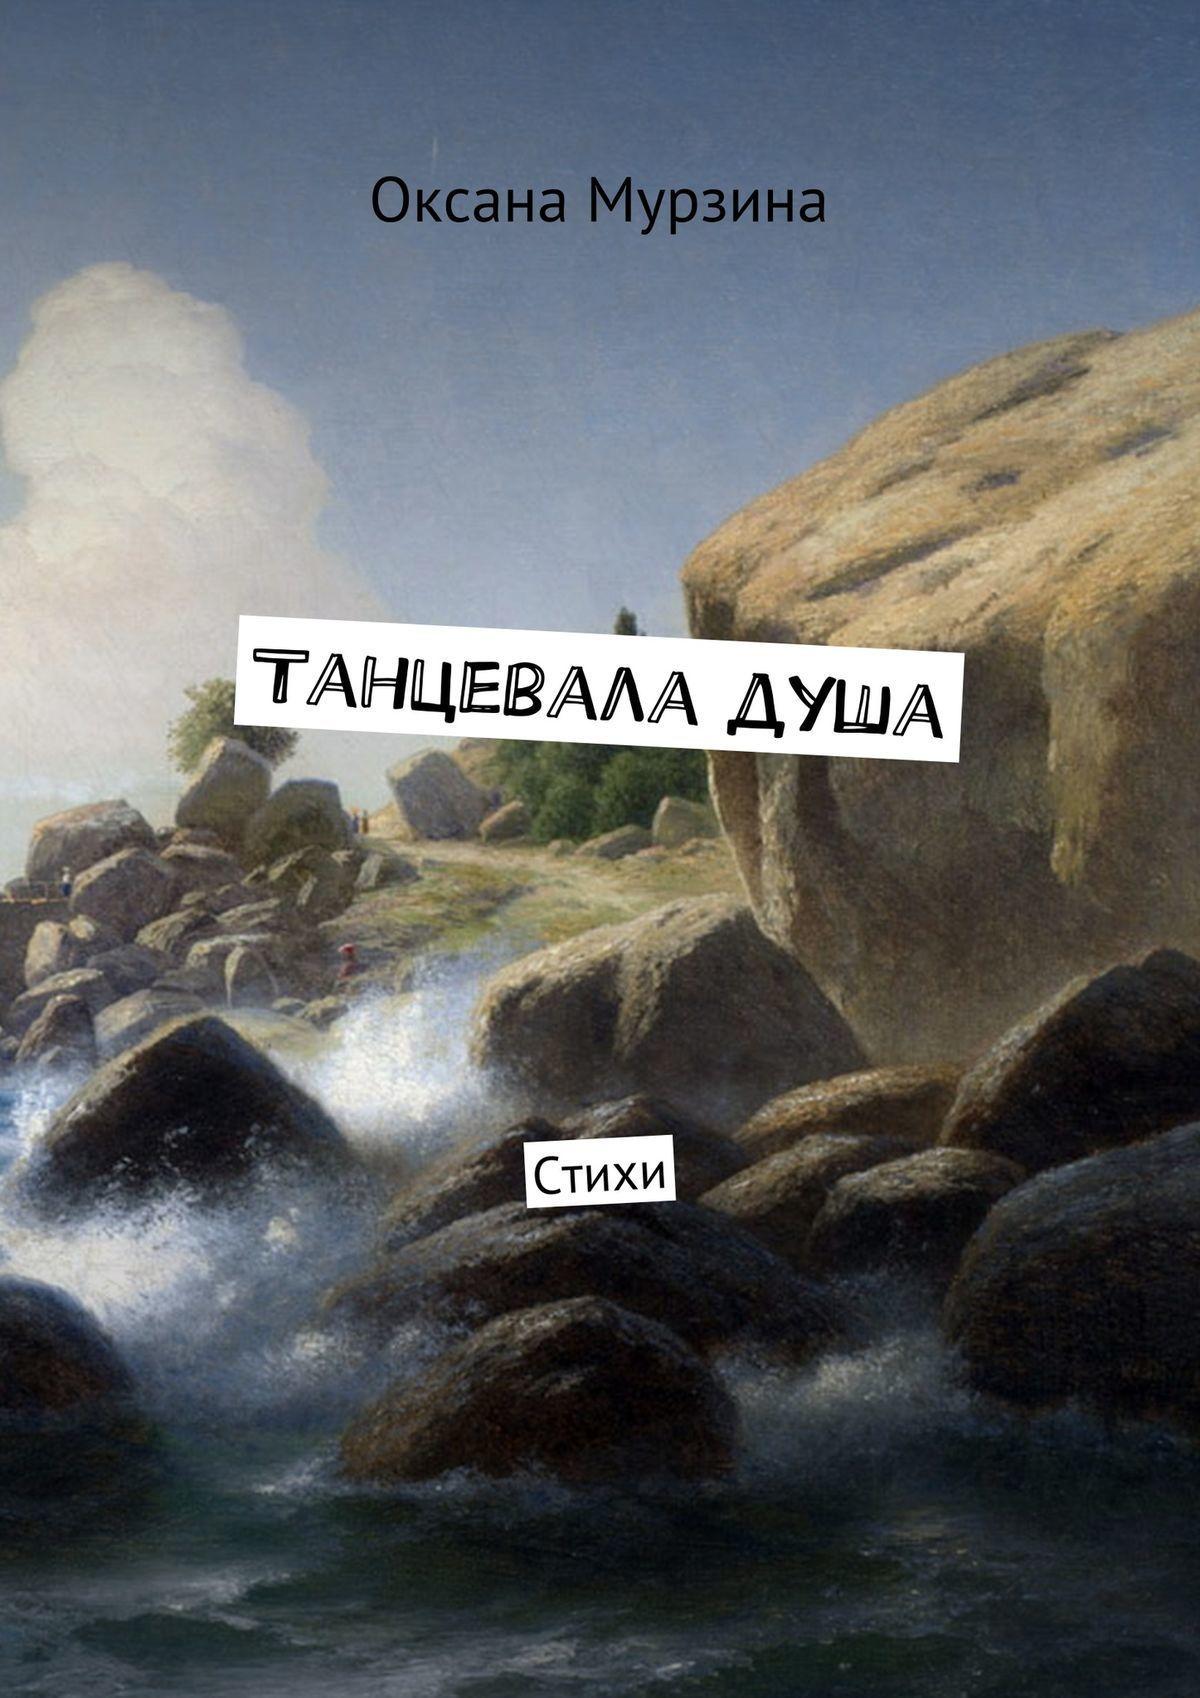 Оксана Мурзина Танцеваладуша. Стихи оксана самыгина белоснежный нарцисс стихи